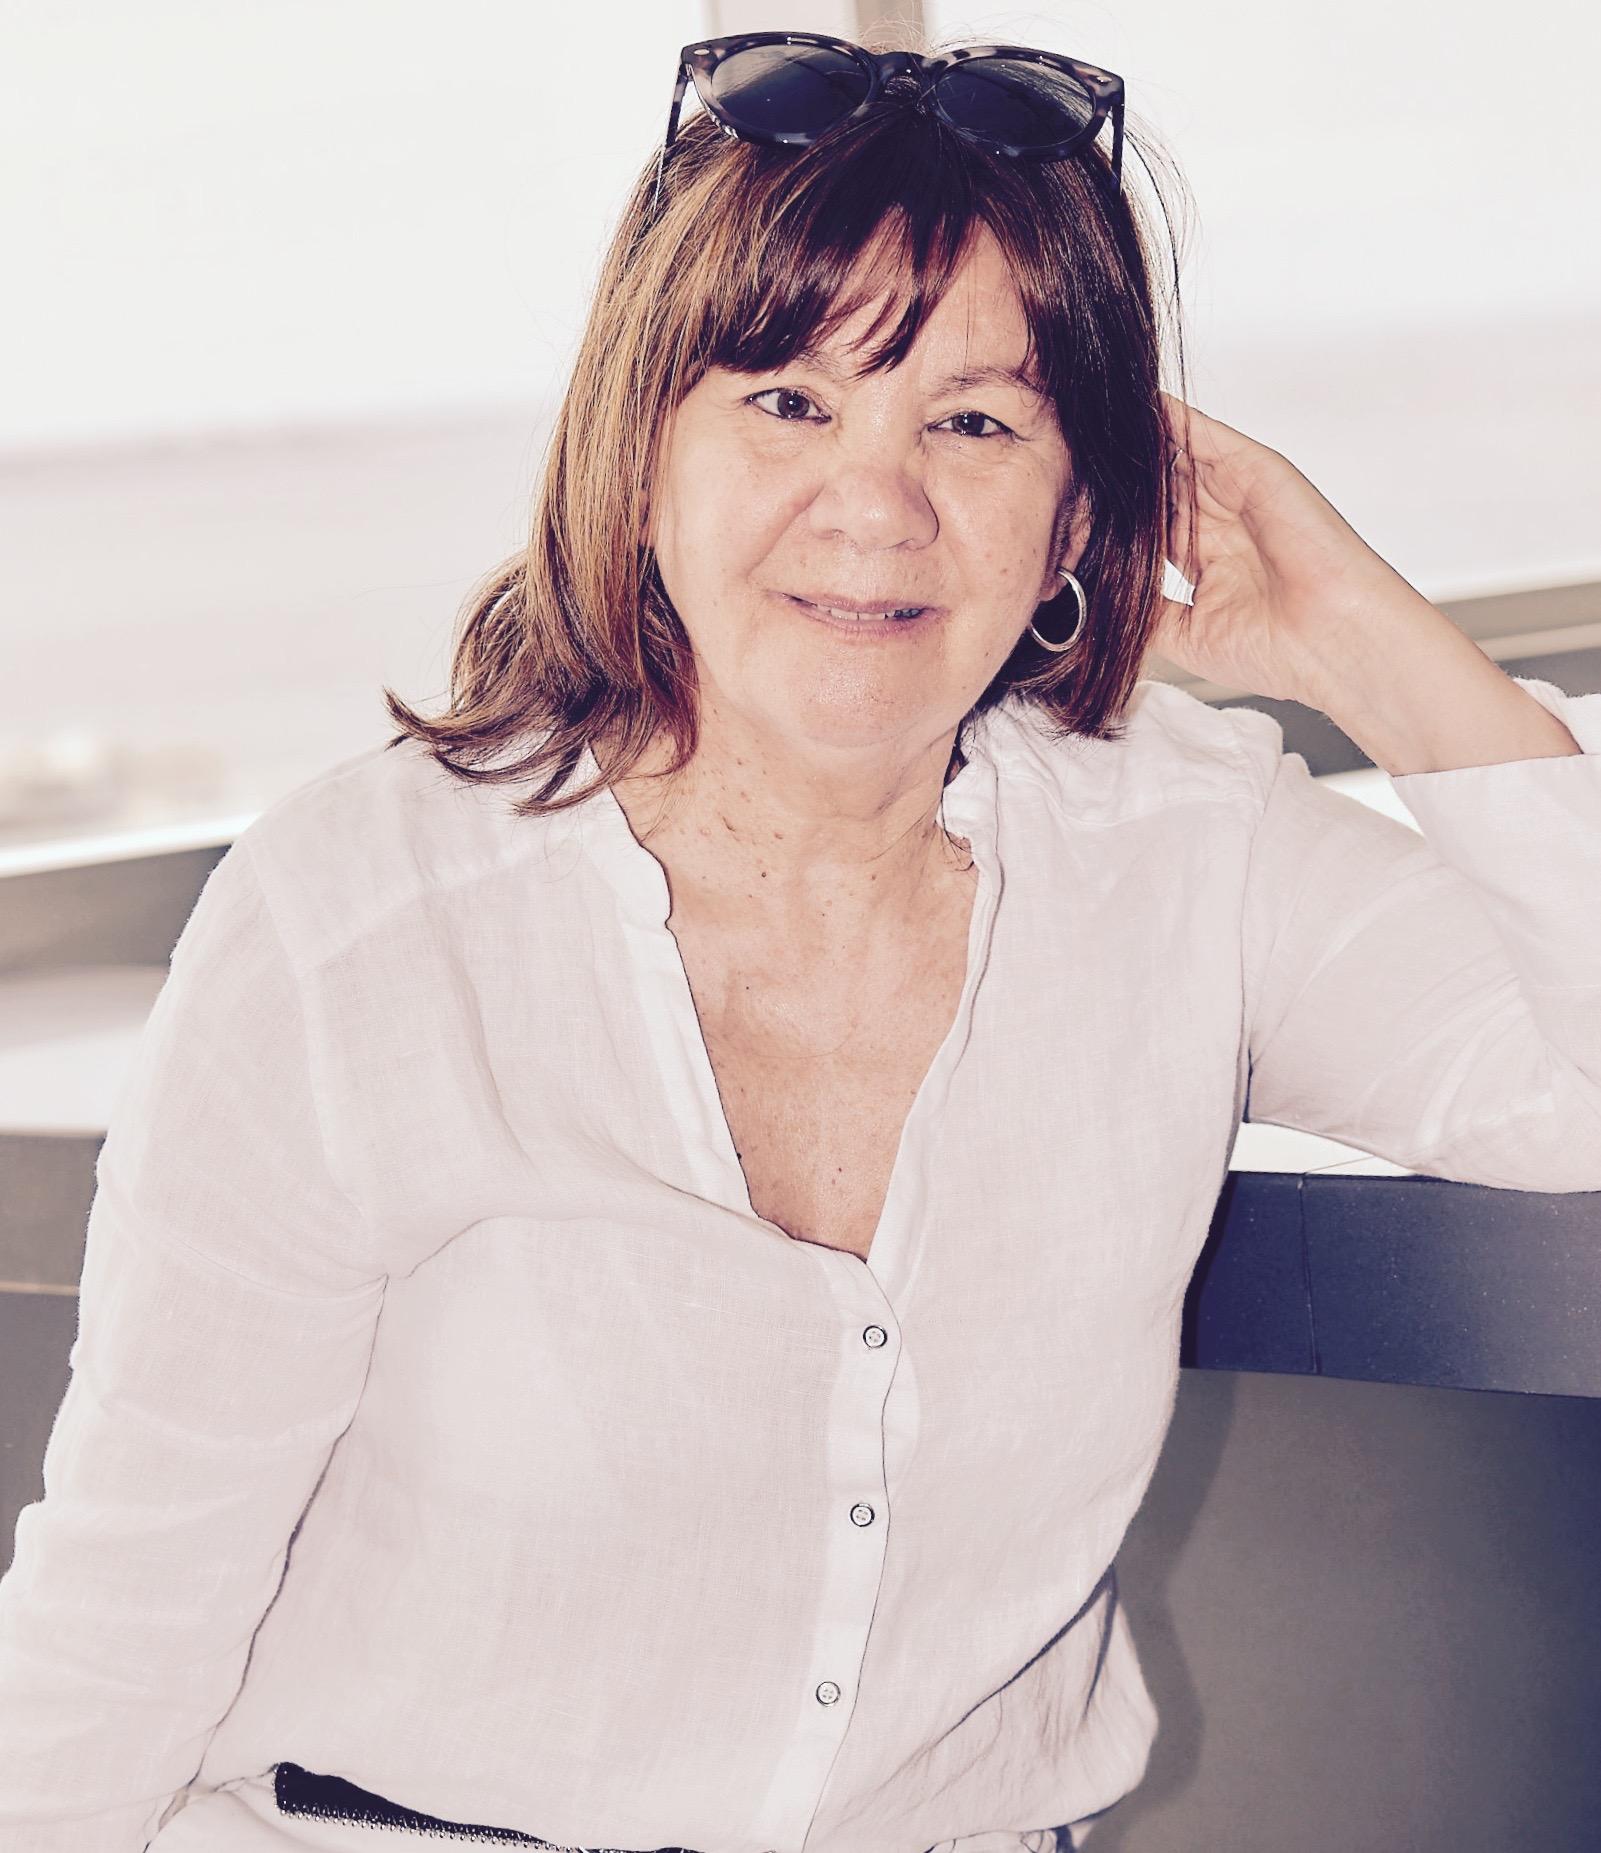 María Sotelo de Barboza